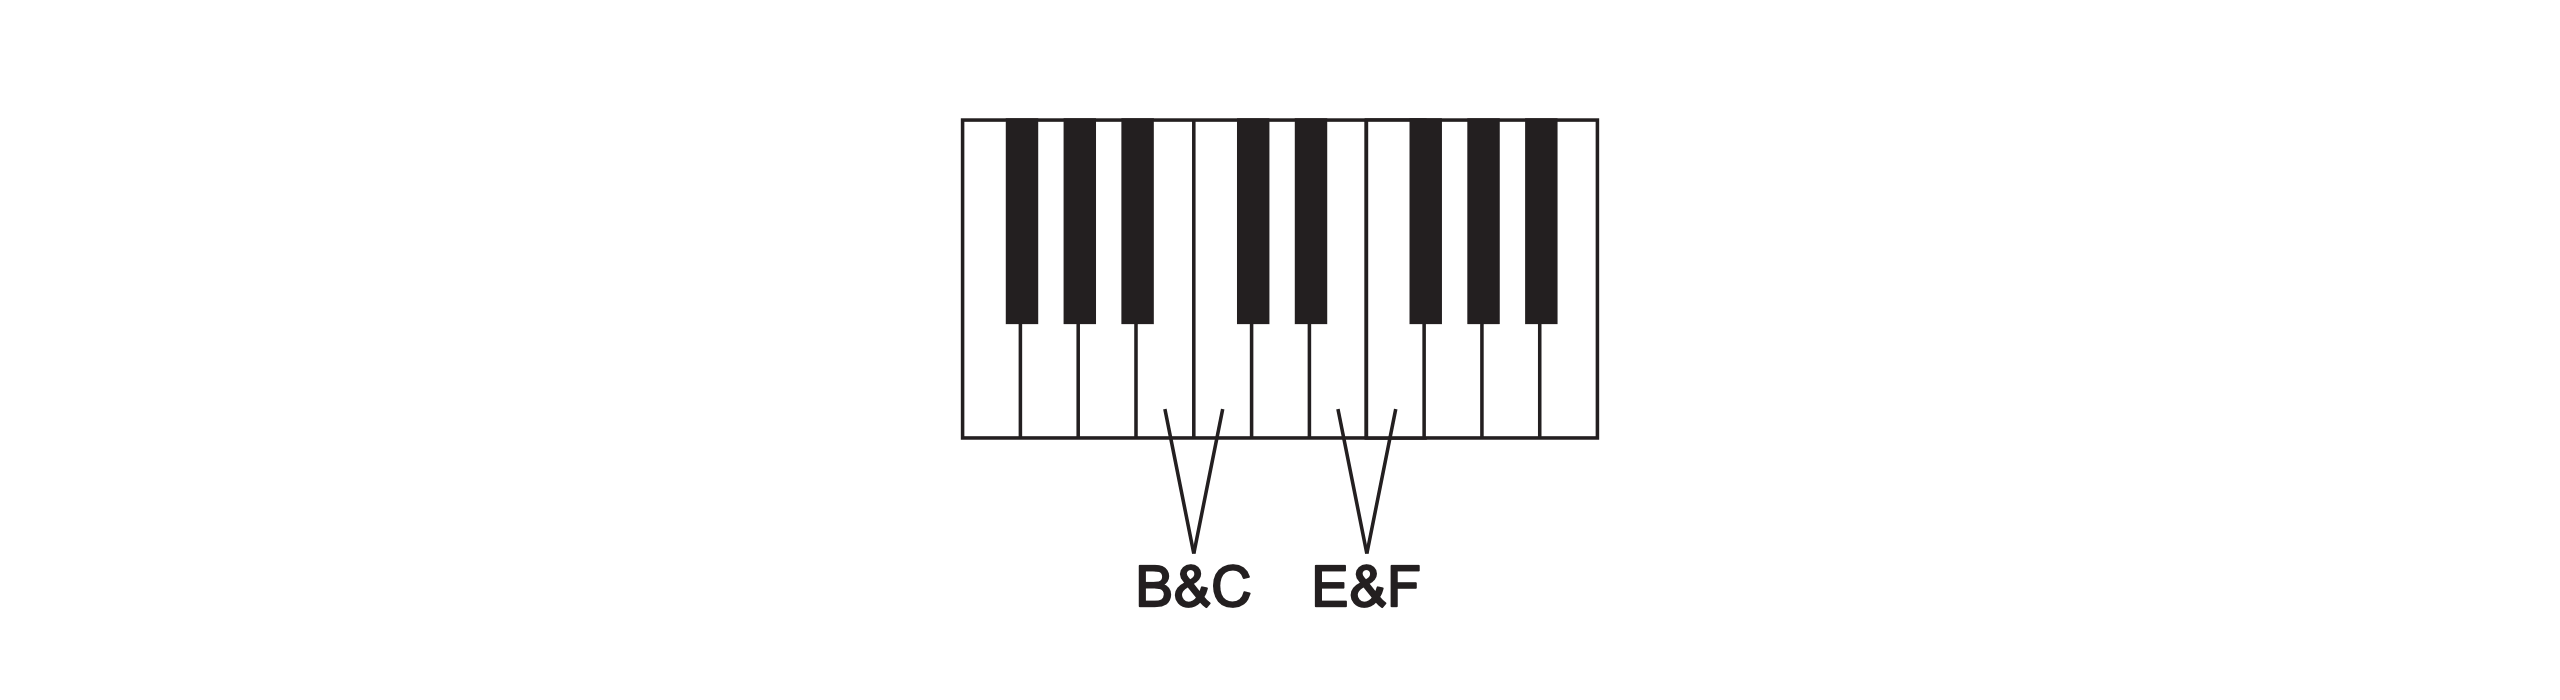 Mibac music lessons i fundamentals